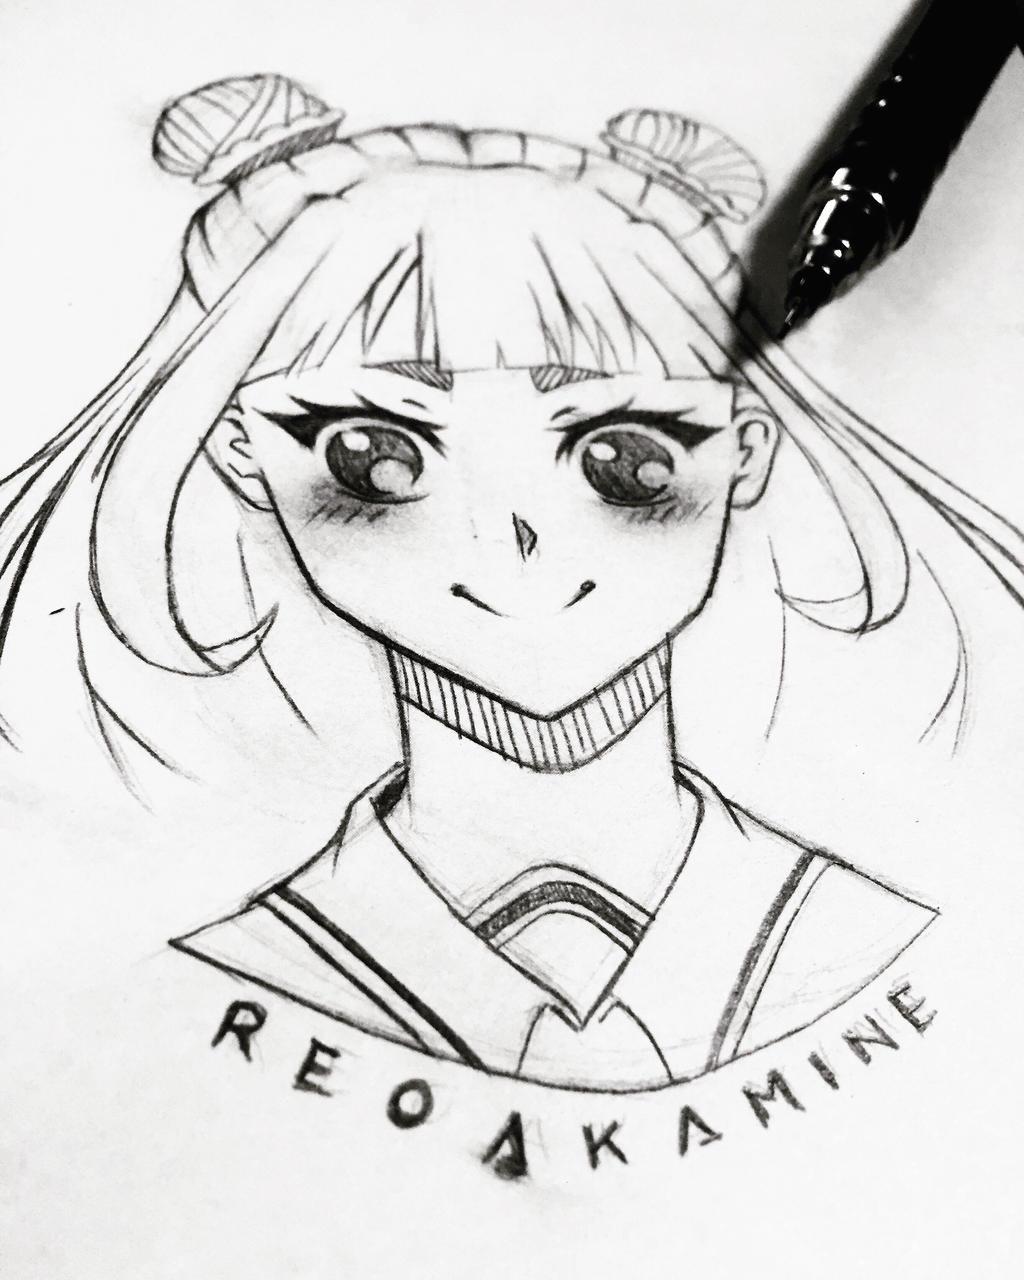 Cutie by ReoAkamine